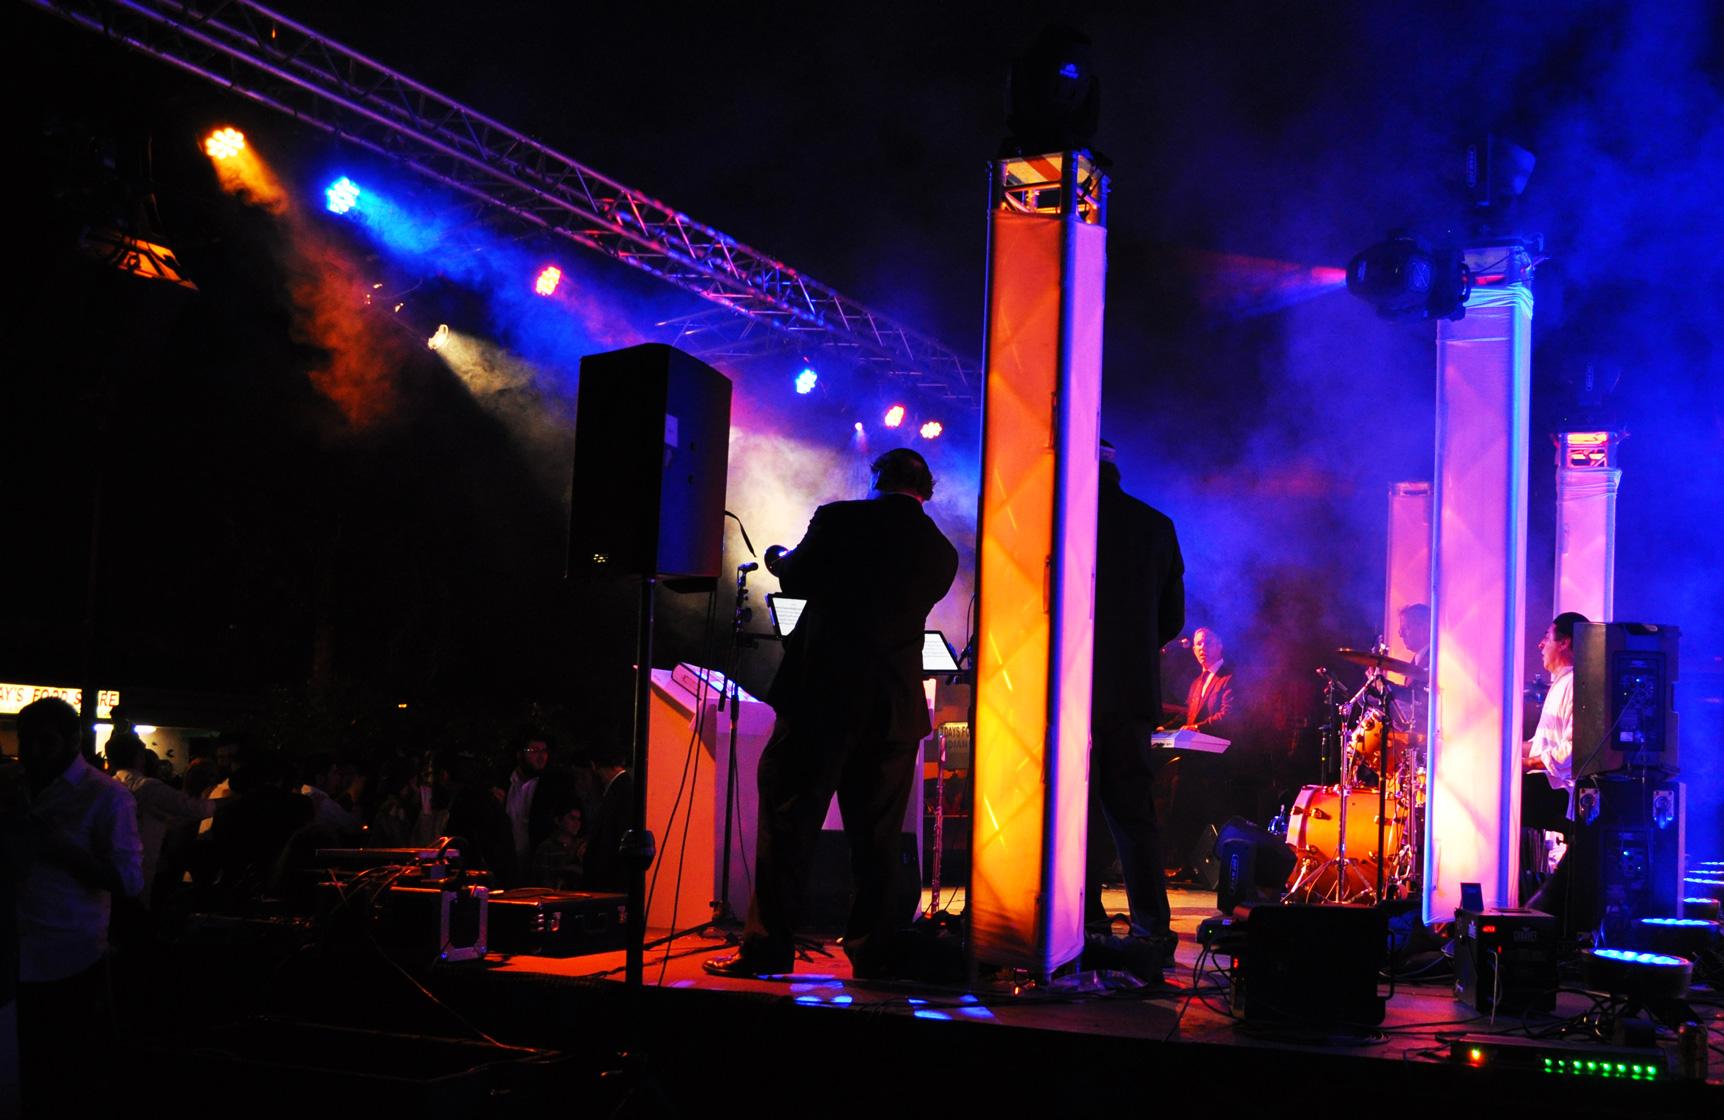 concerts-live-music-padano-productions32.jpg